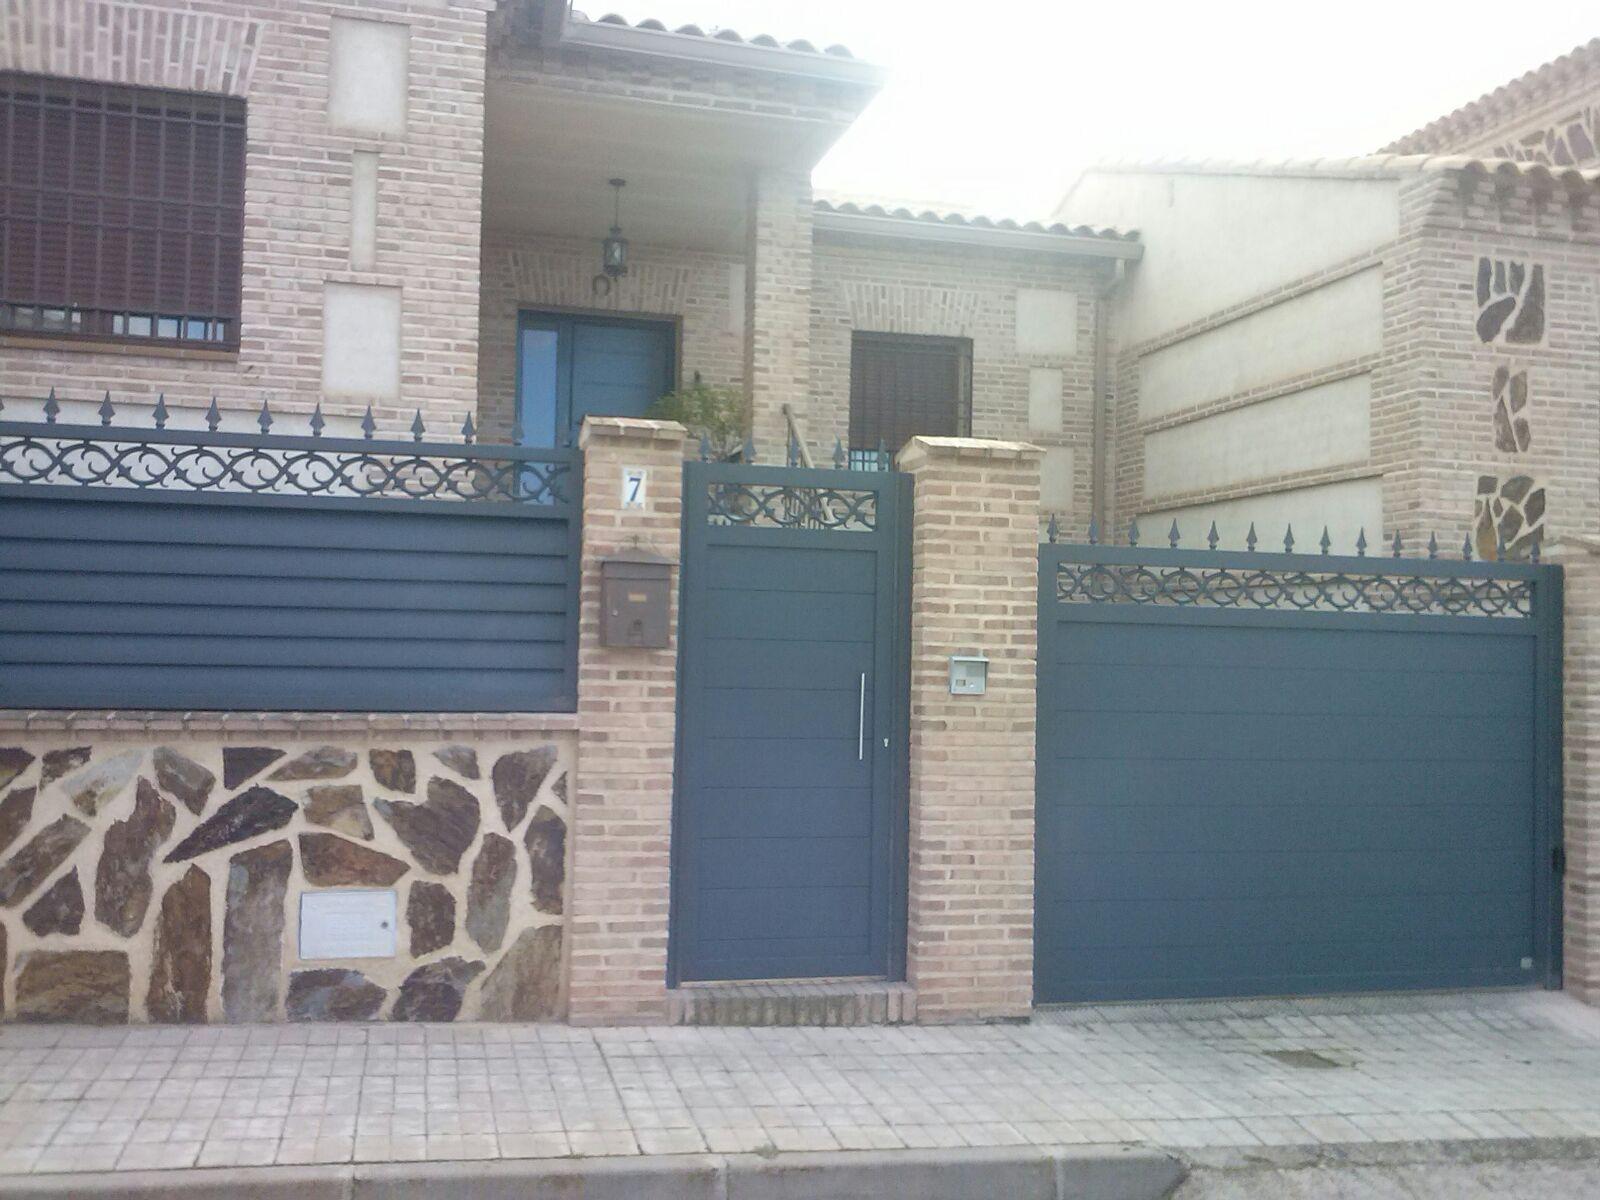 Puertas de aluminio para exterior grupo marver - Puertas de aluminio para exterior fotos ...